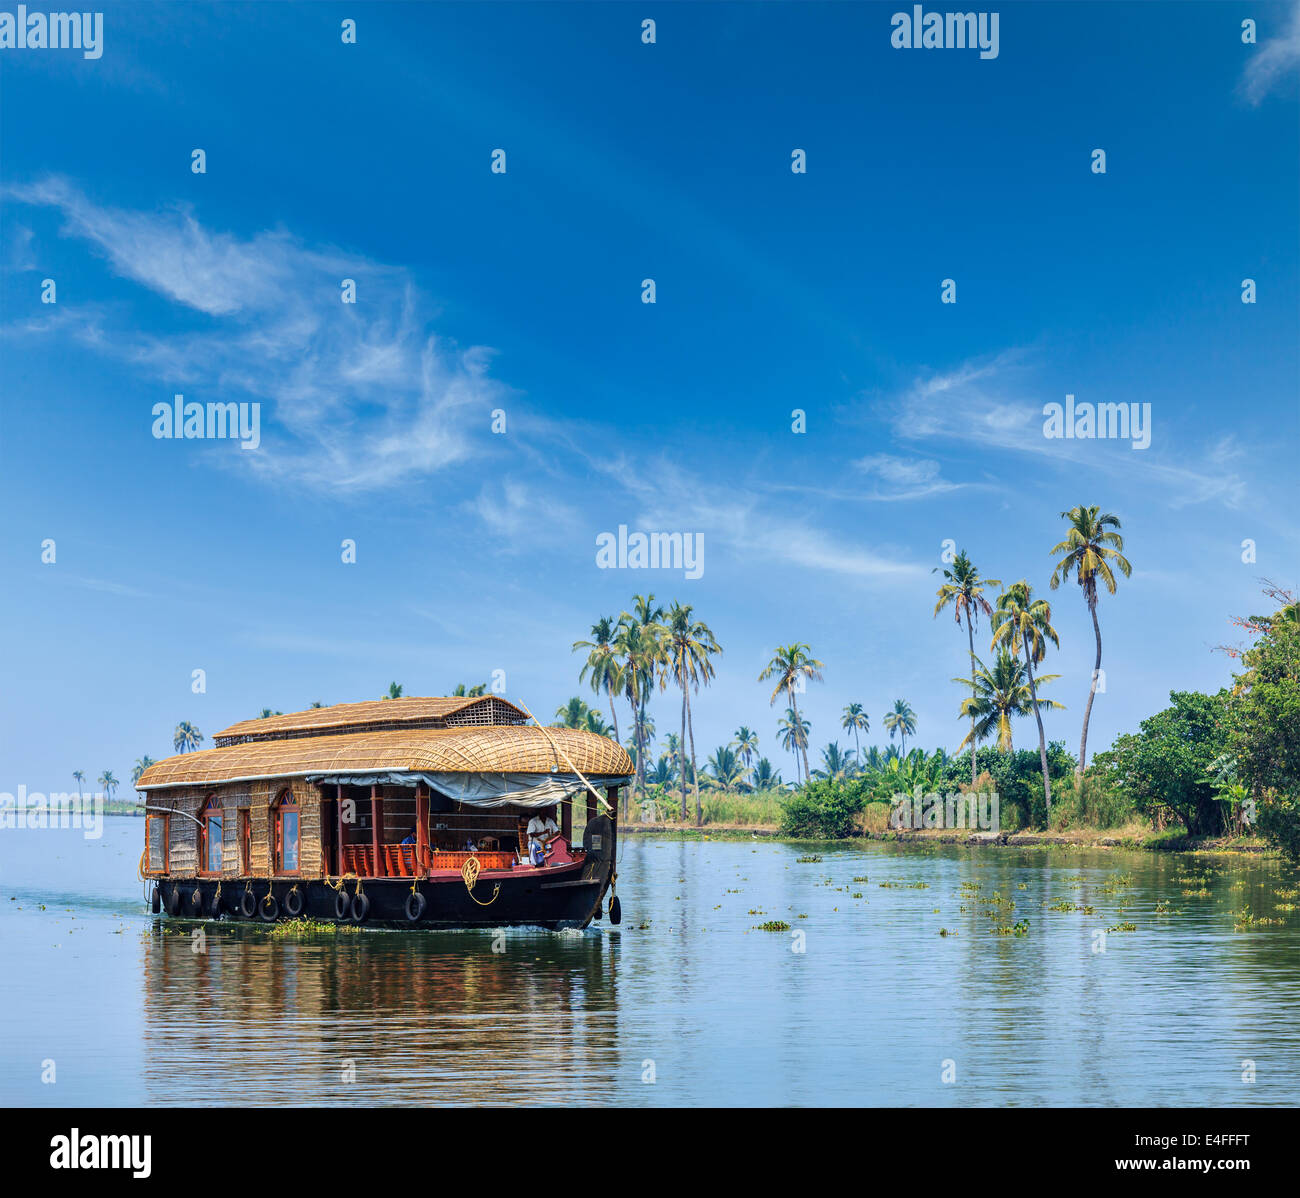 Travel Tourism Kerala Background